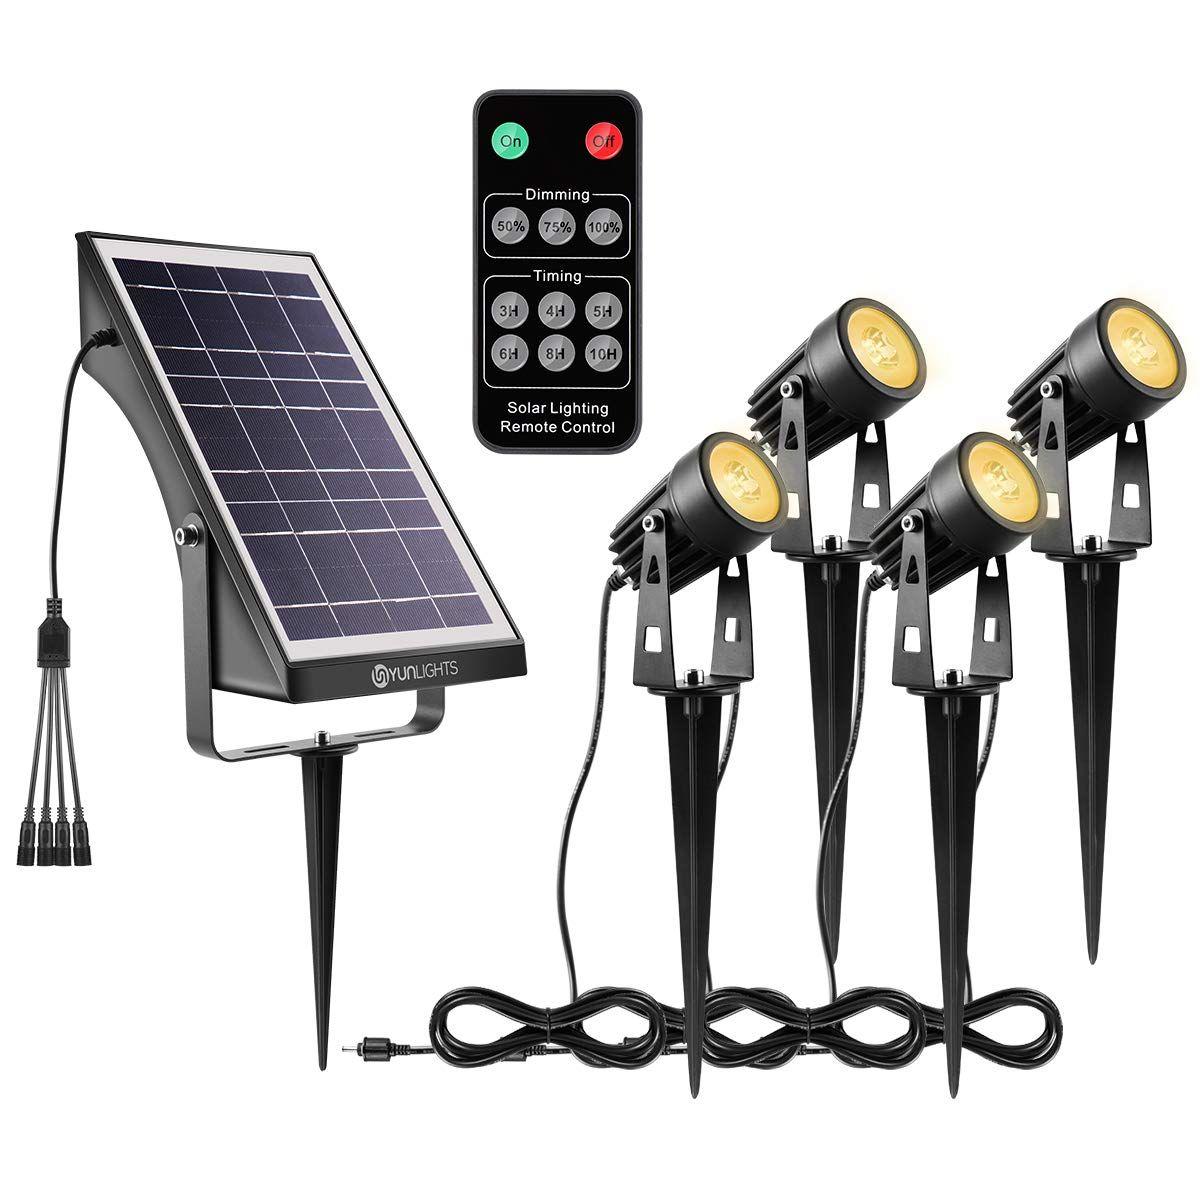 YUNLIGHTS Solar Landscape Lights, Low Voltage Outdoor